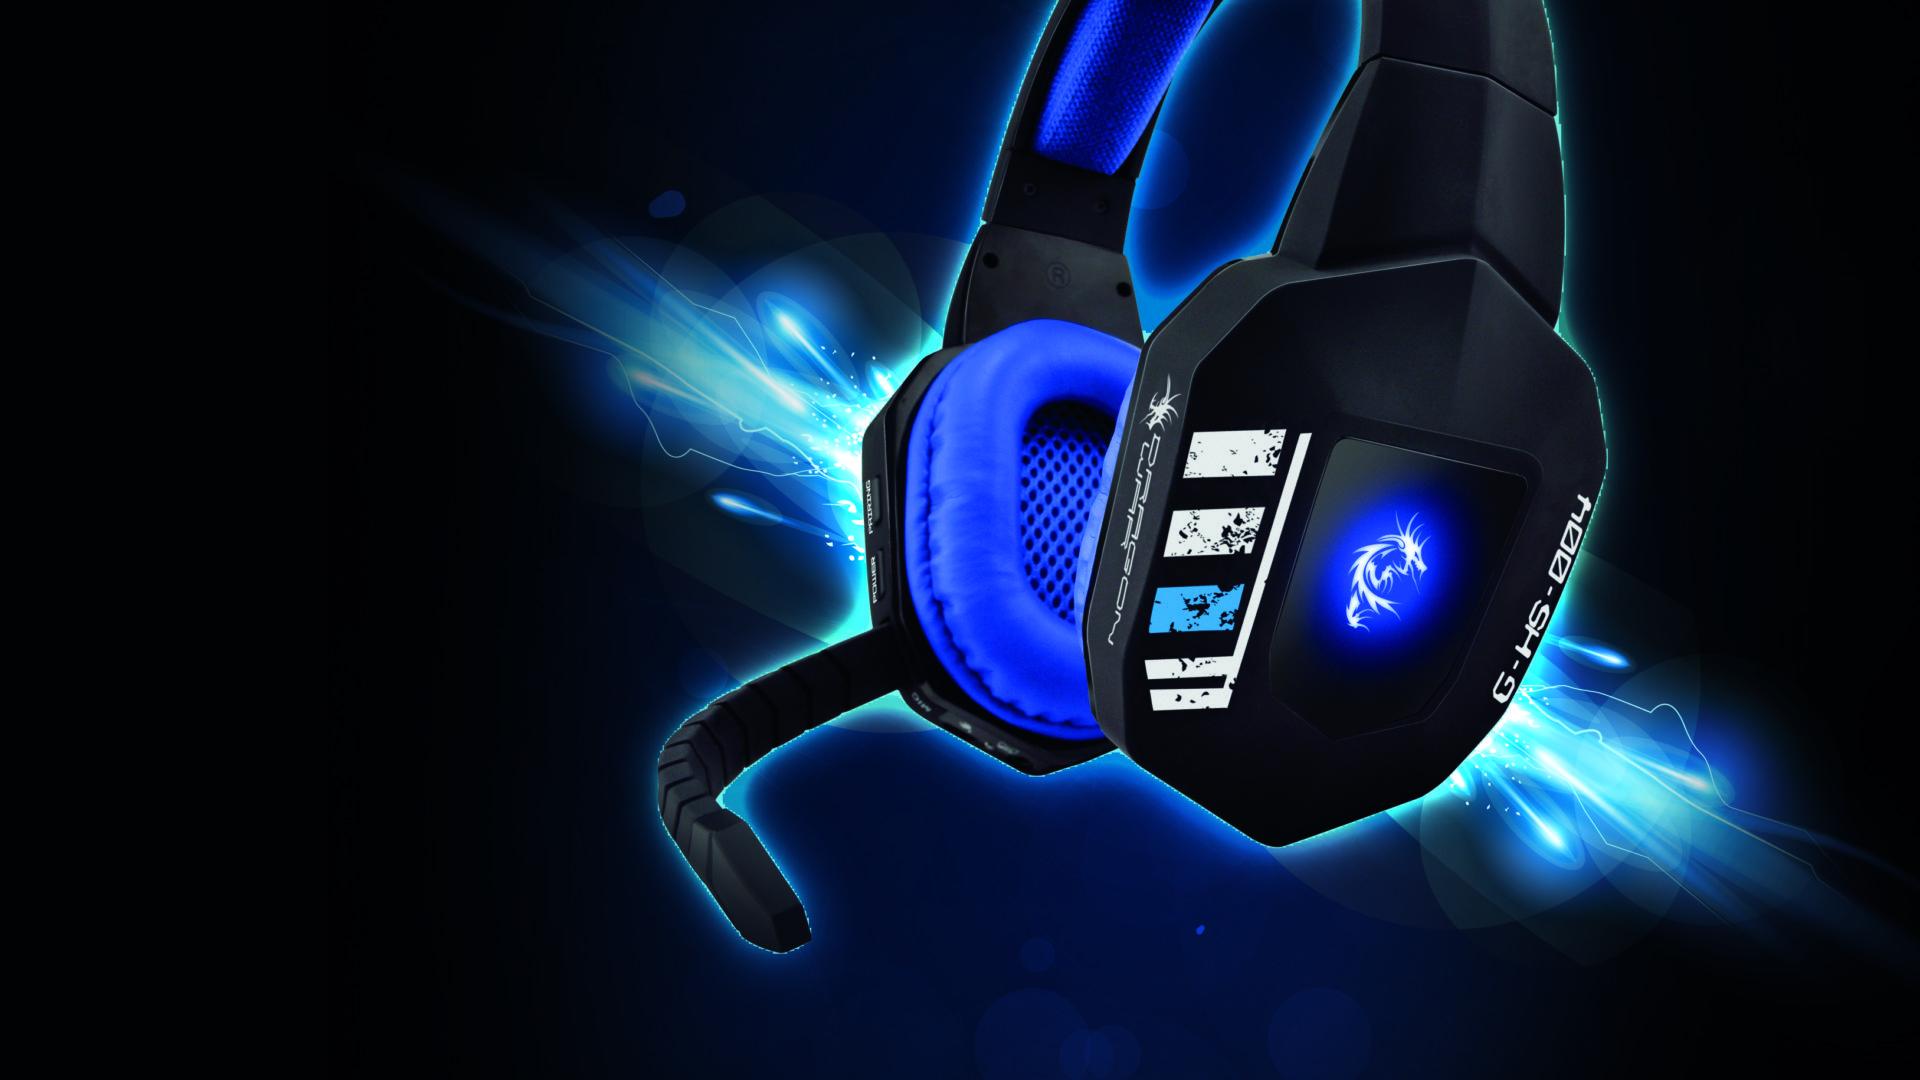 Dragon War Aegis Wireless Gaming Headset Ps4 Test Pxlbbq